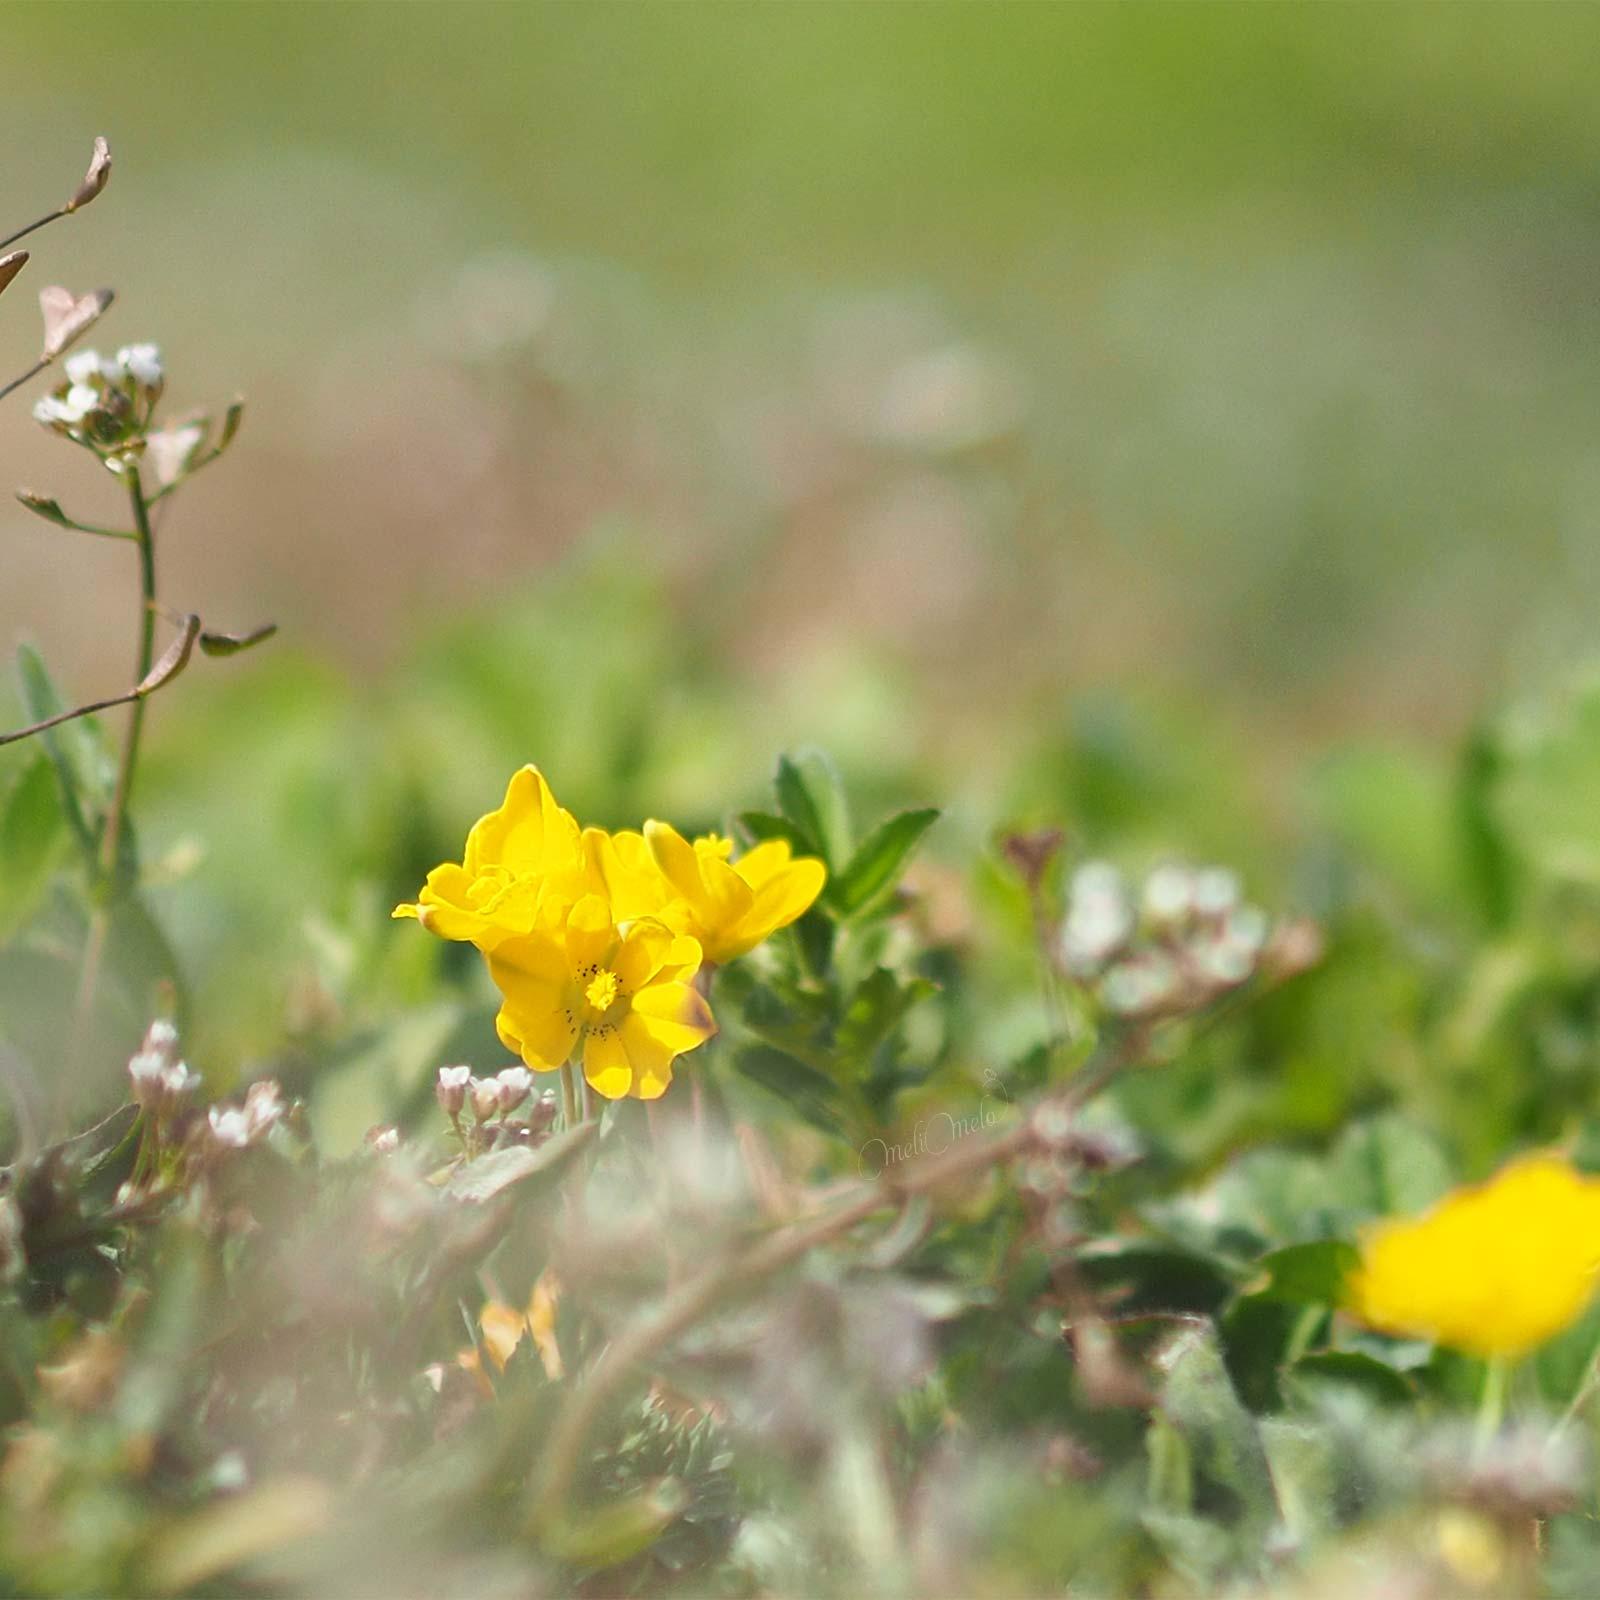 fleurs-jaune-printemps